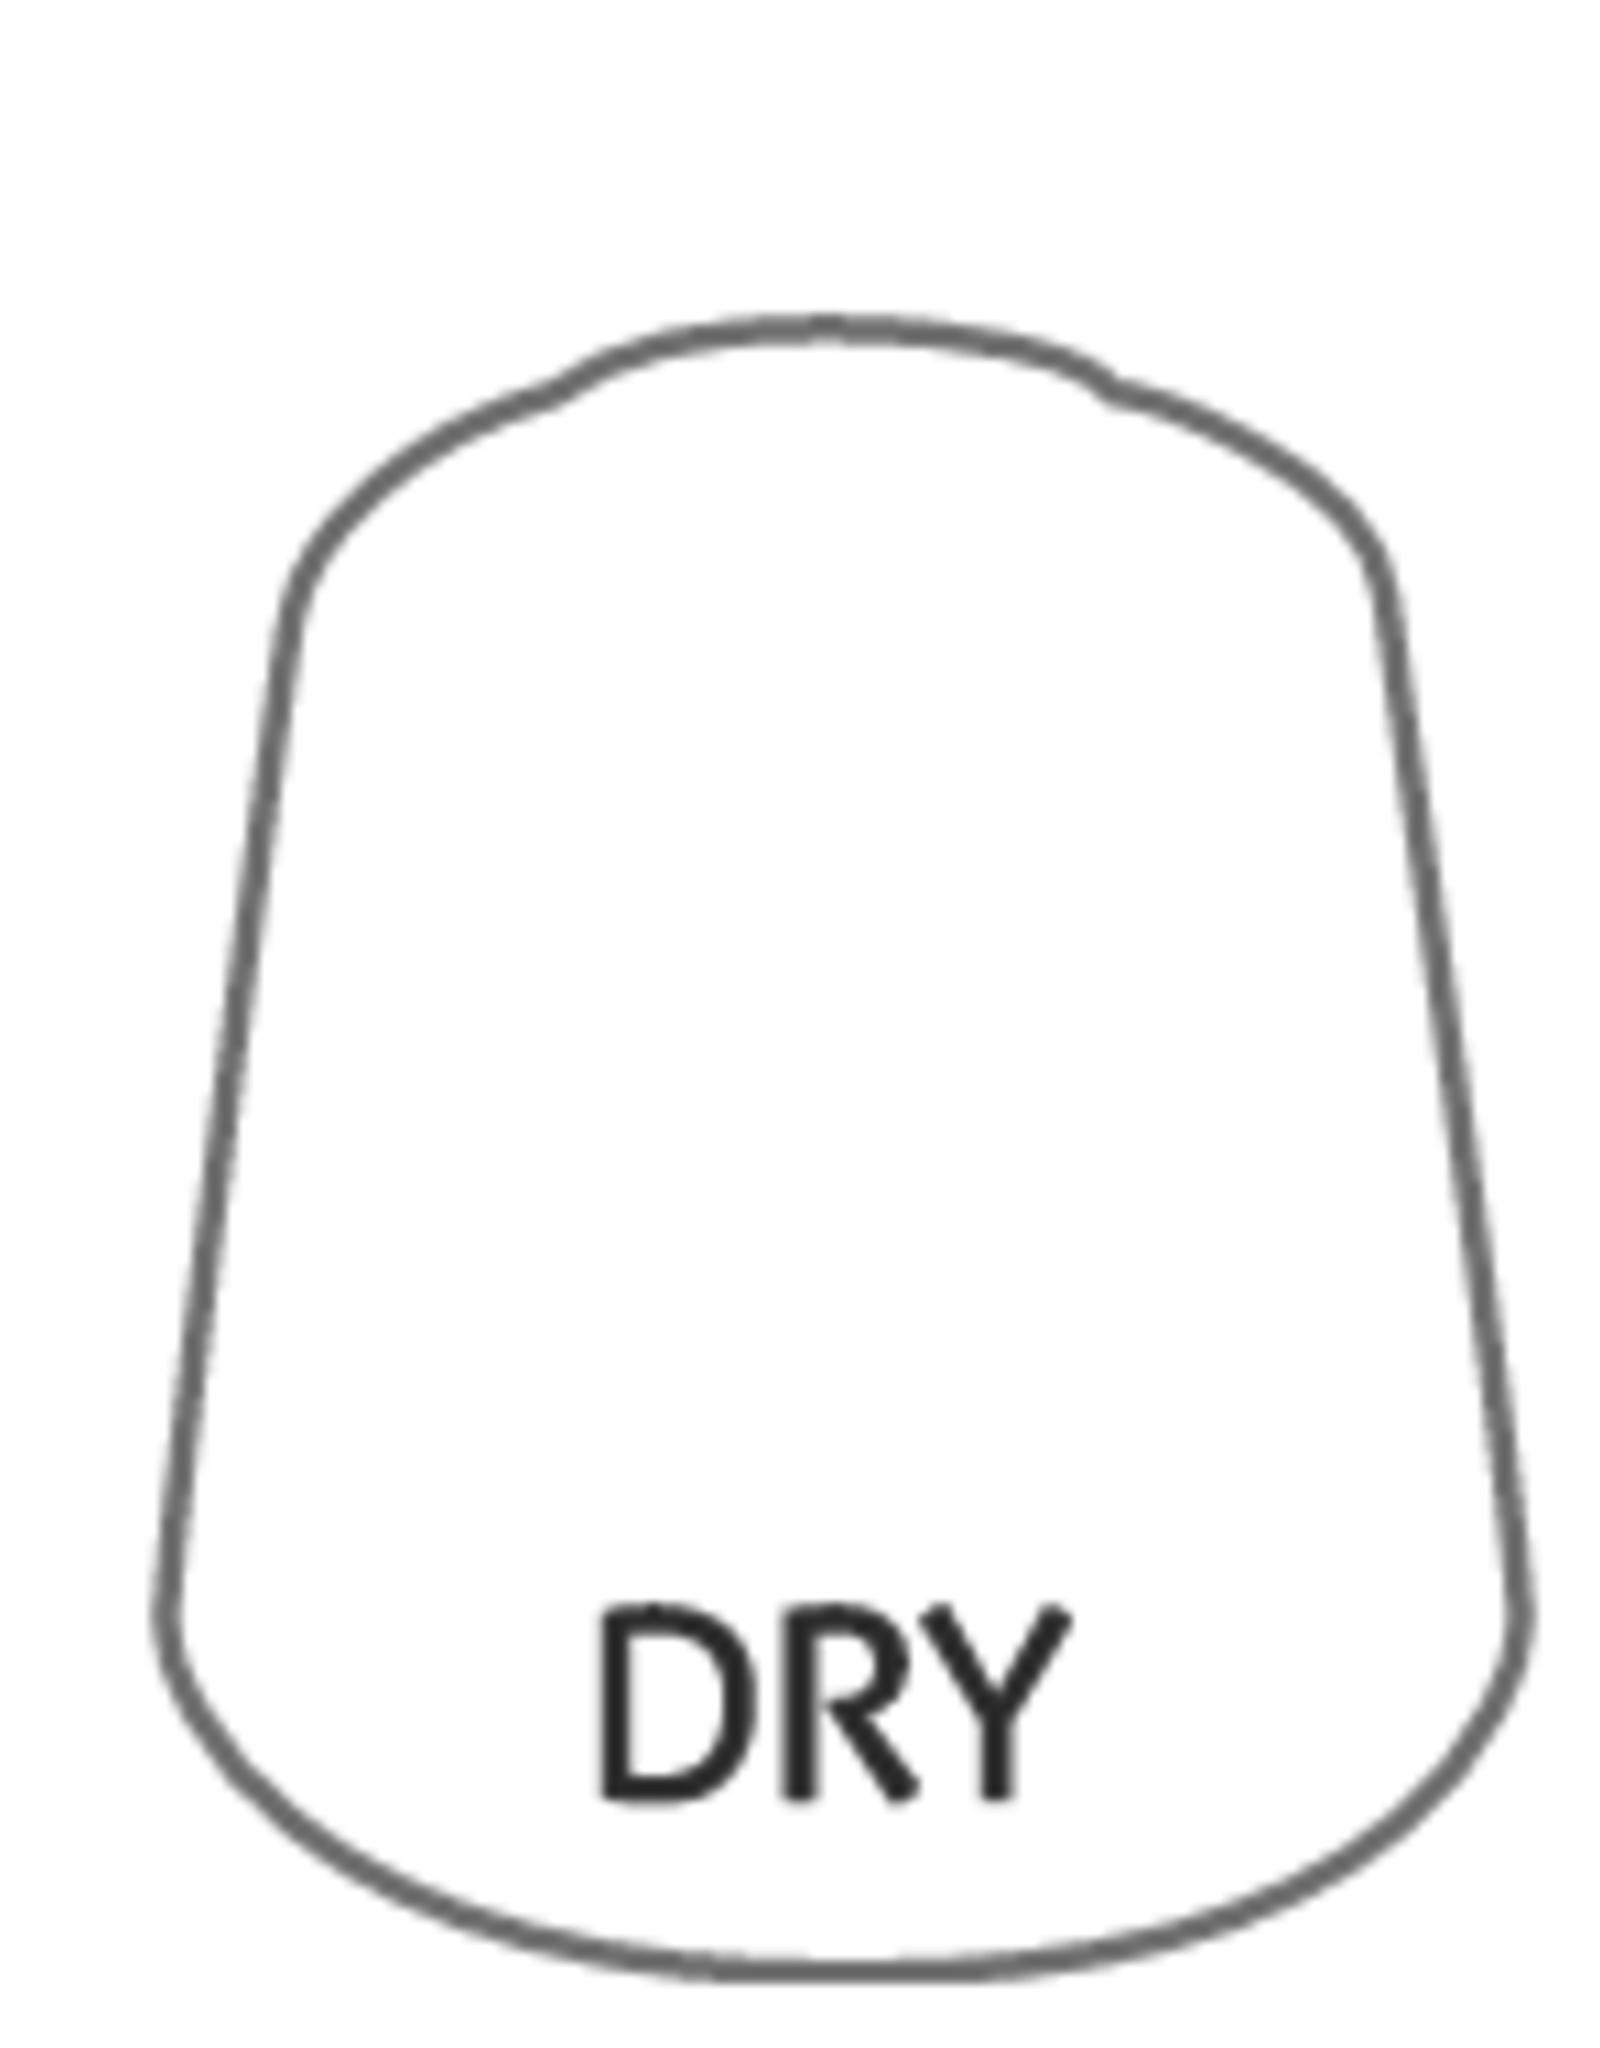 Games Workshop Dry: Praxeti White (12ML) Paint